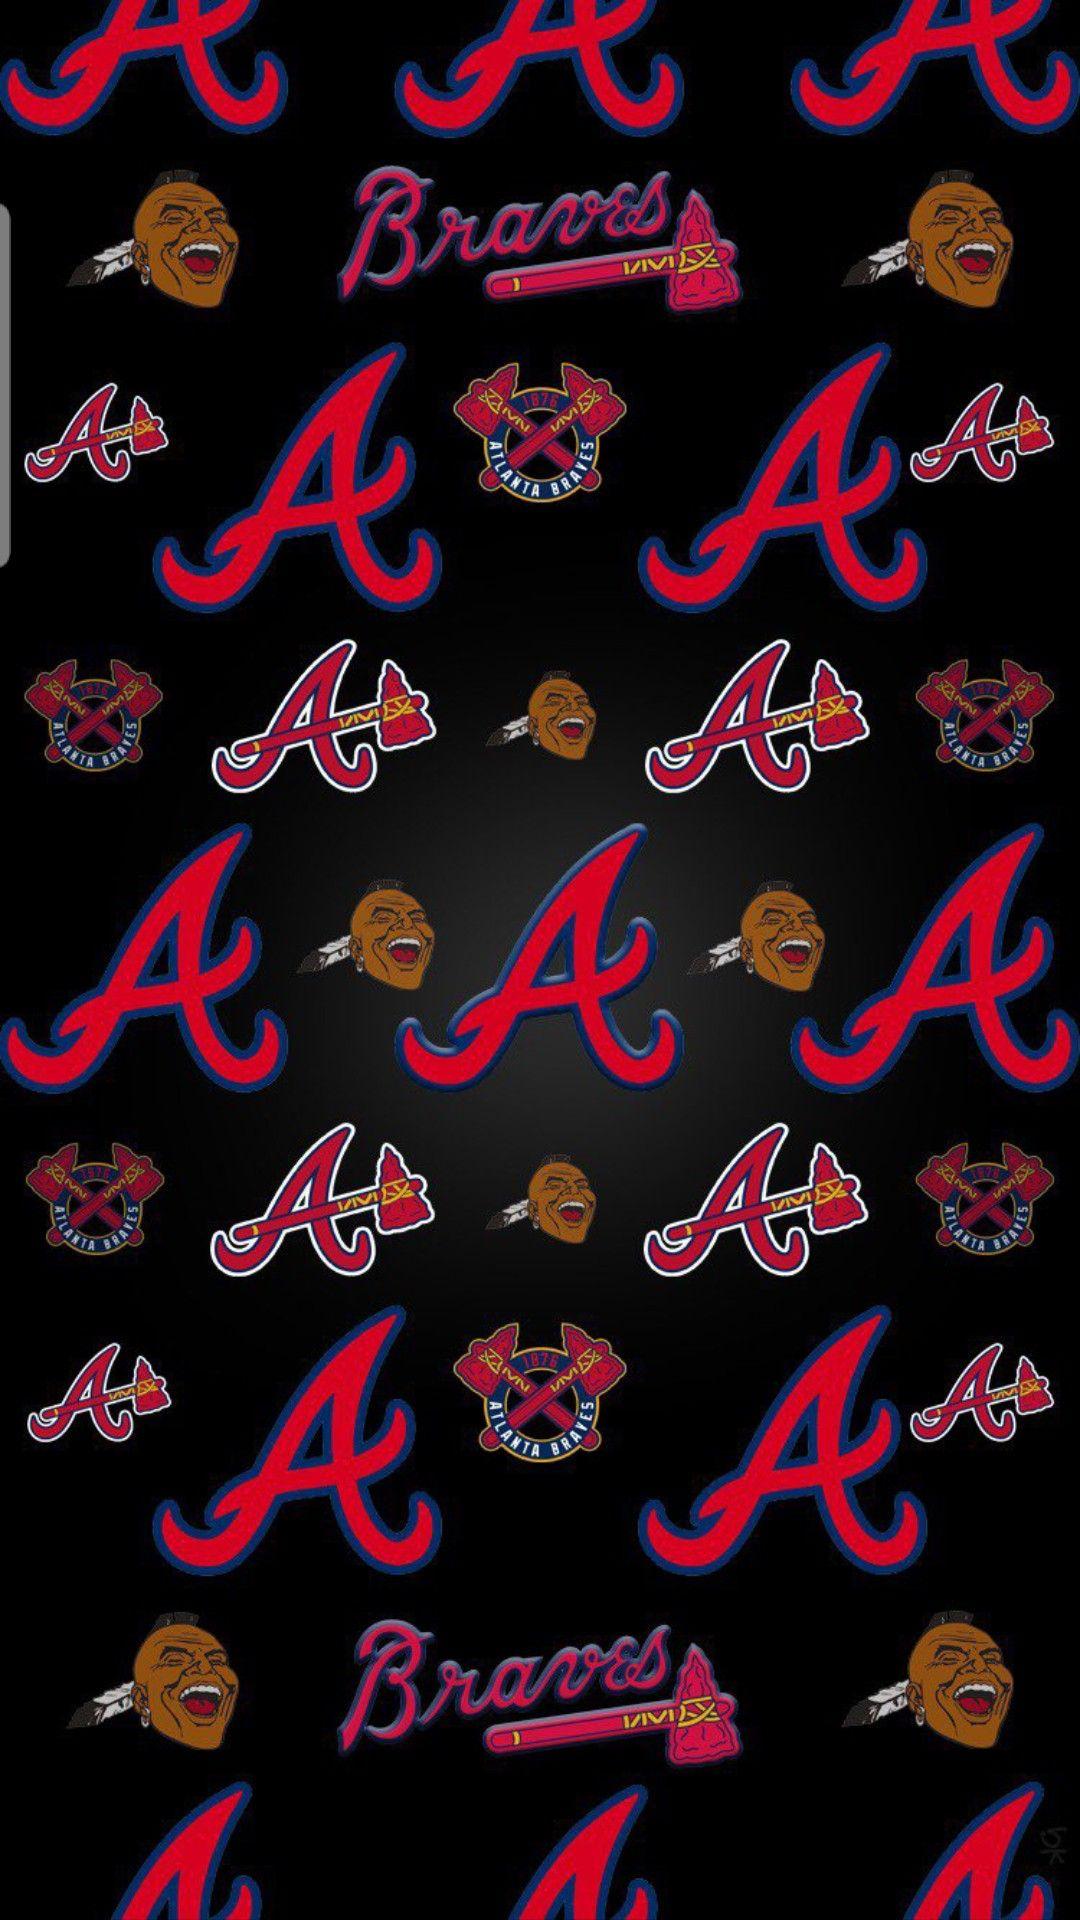 Pin By Atl 305 On Atlanta Braves Atlanta Braves Wallpaper Atlanta Braves Baseball Atlanta Braves Logo